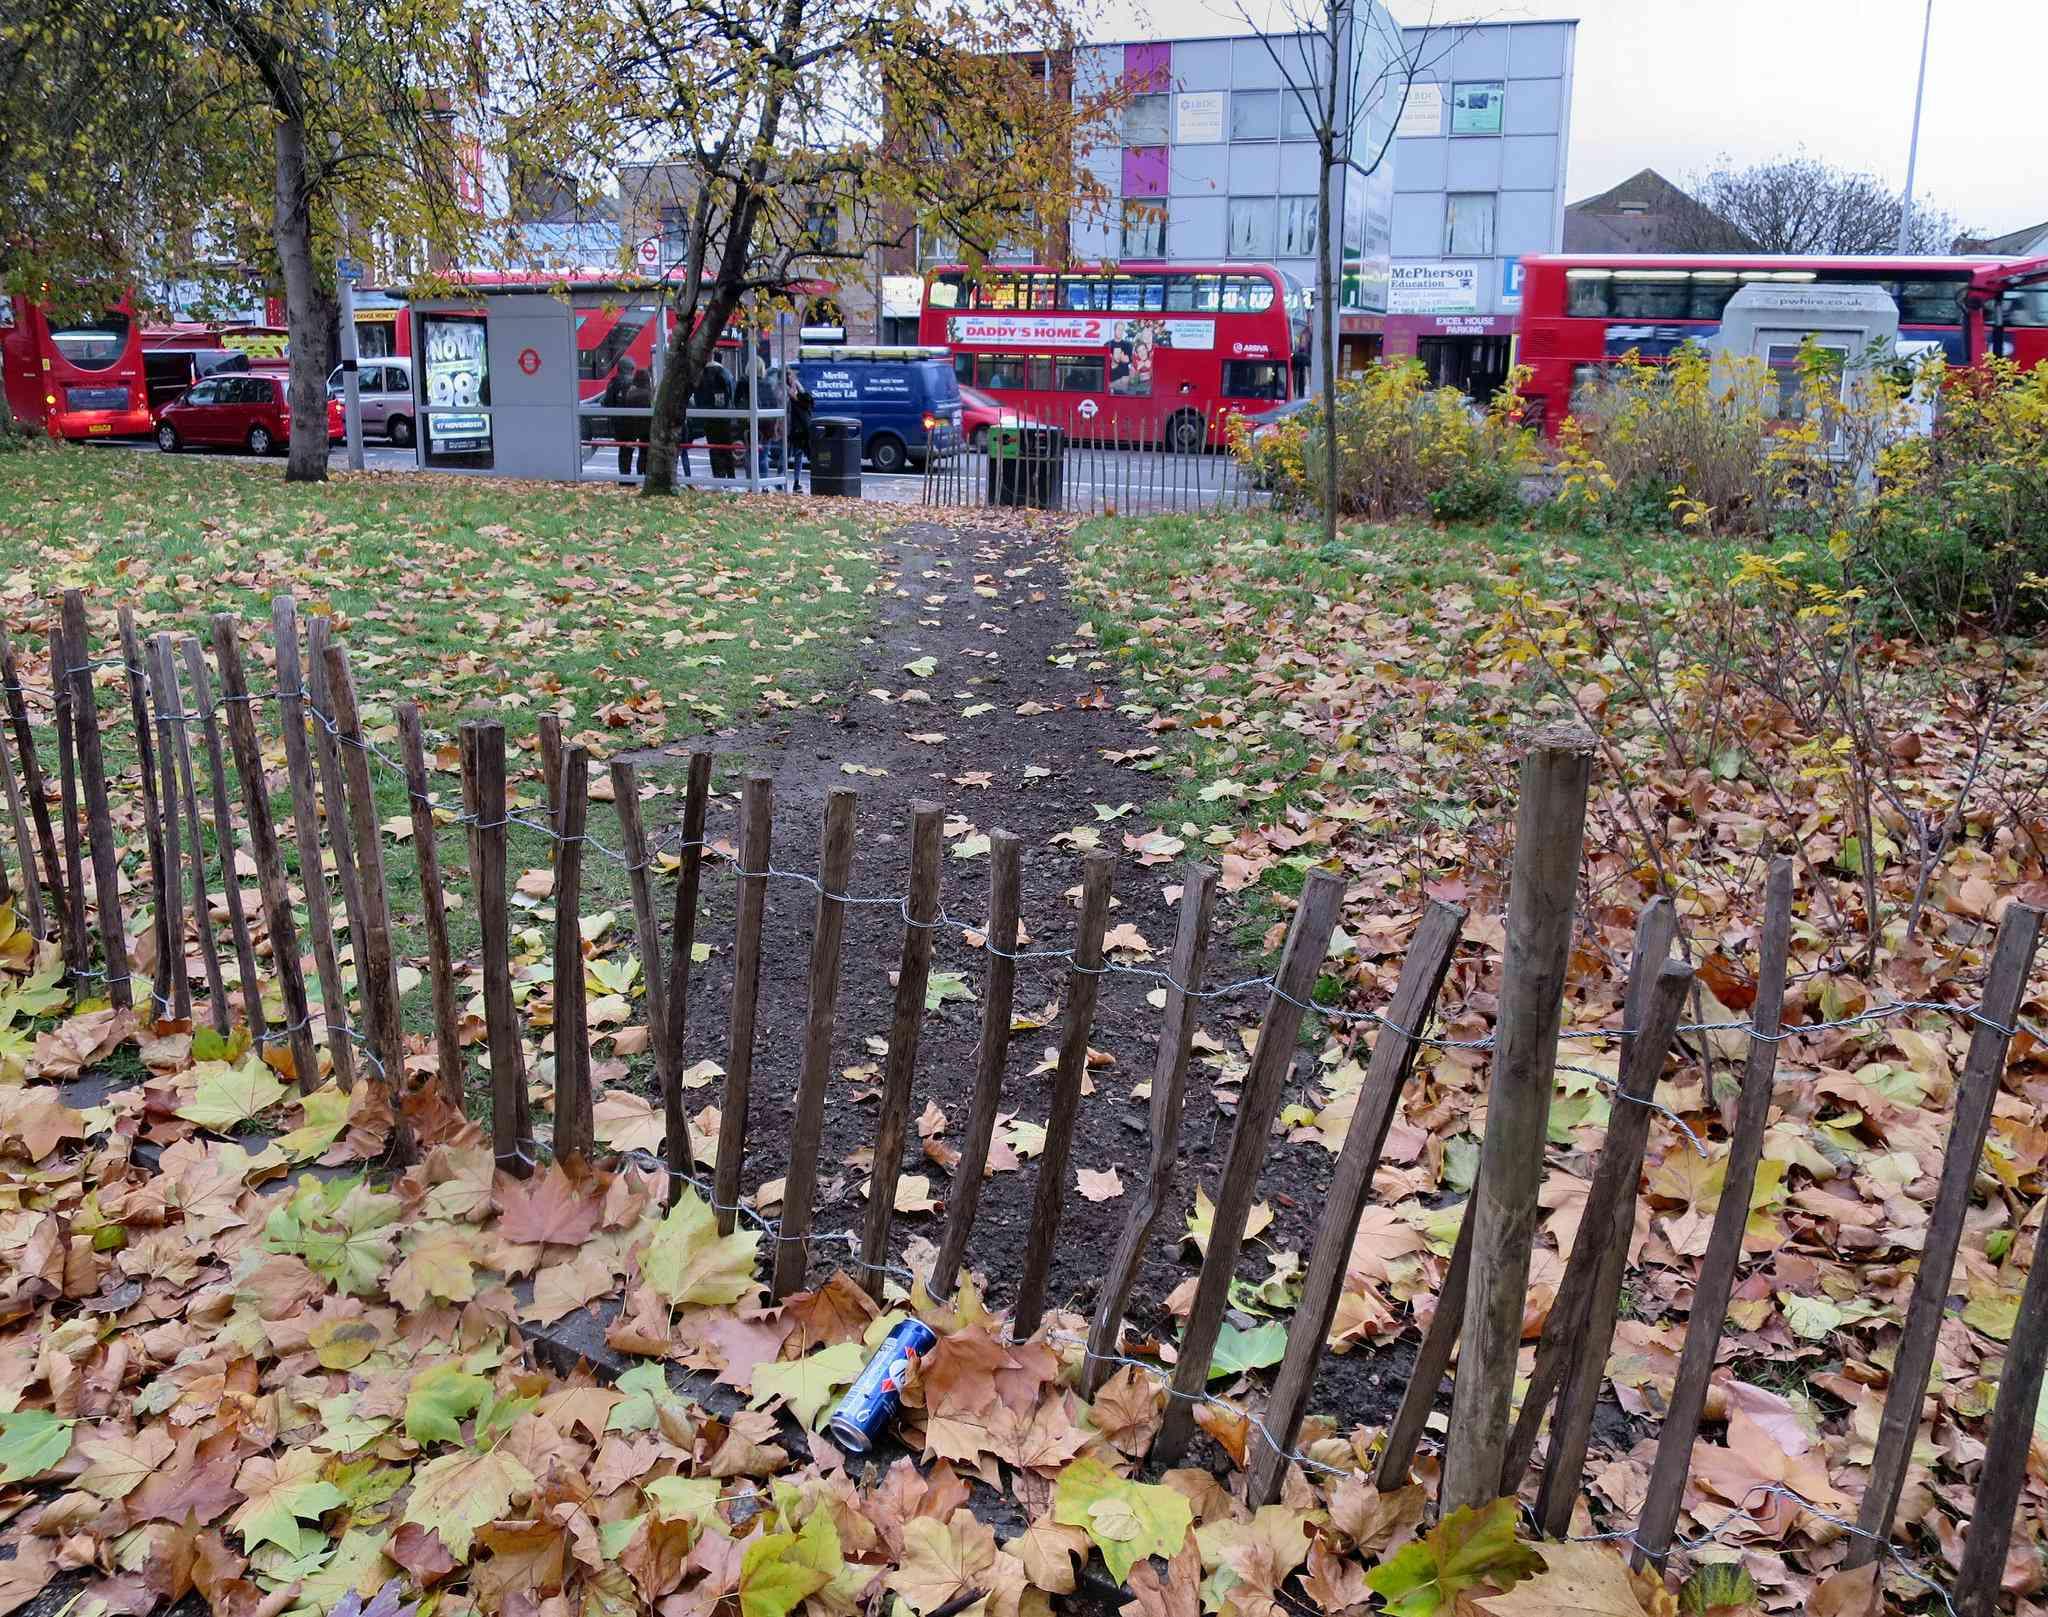 A fenced-off desire path